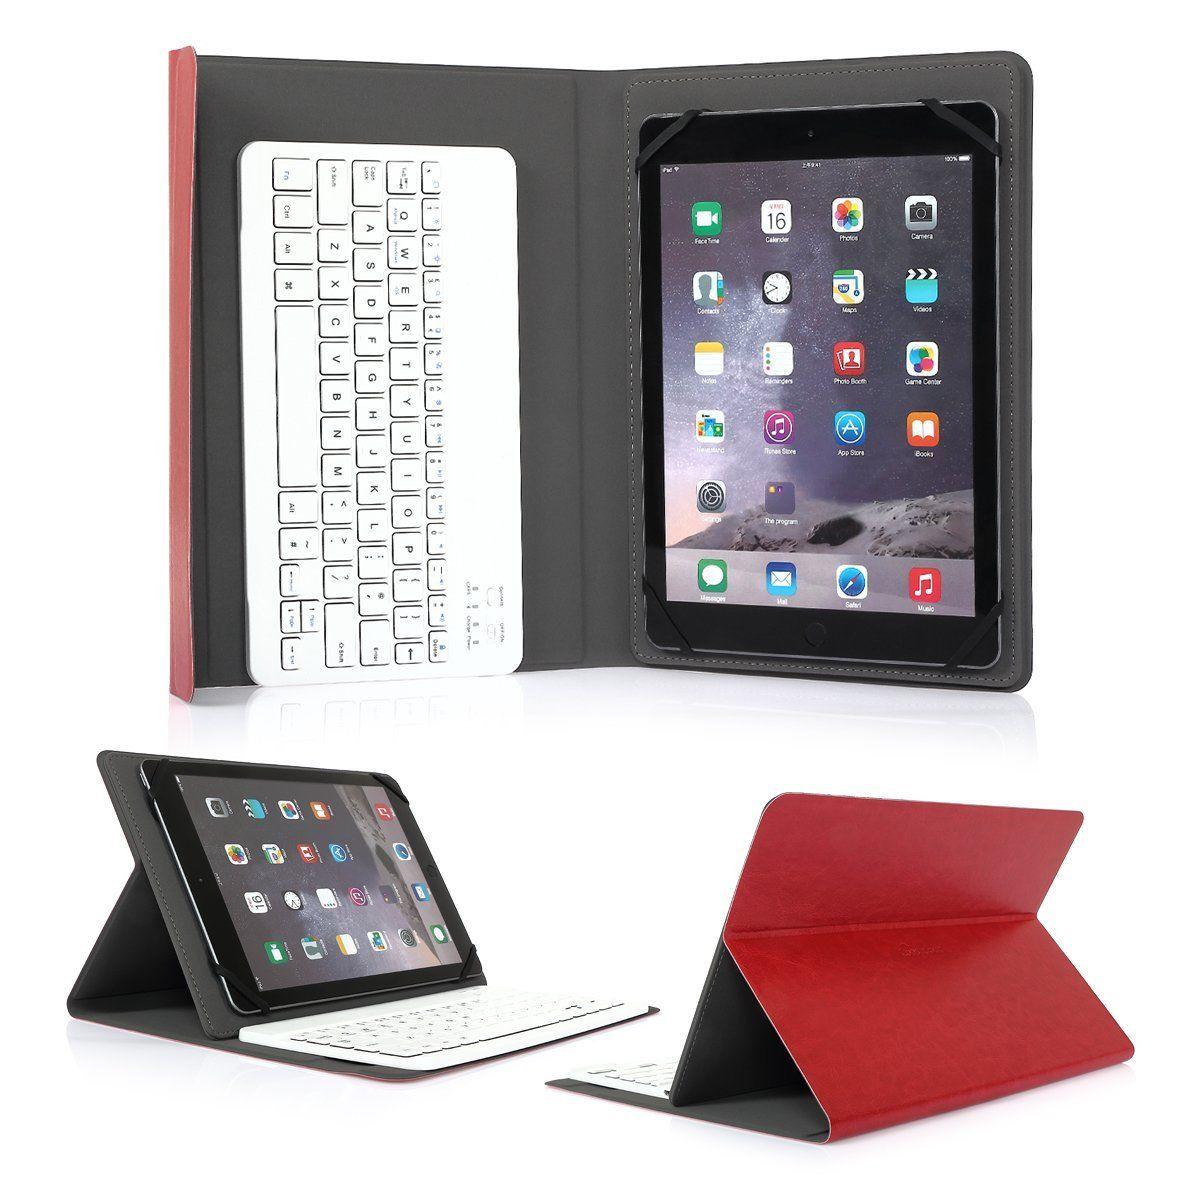 uk layout detachable keyboard case for android ios windows 10 tablet mobile ebay. Black Bedroom Furniture Sets. Home Design Ideas